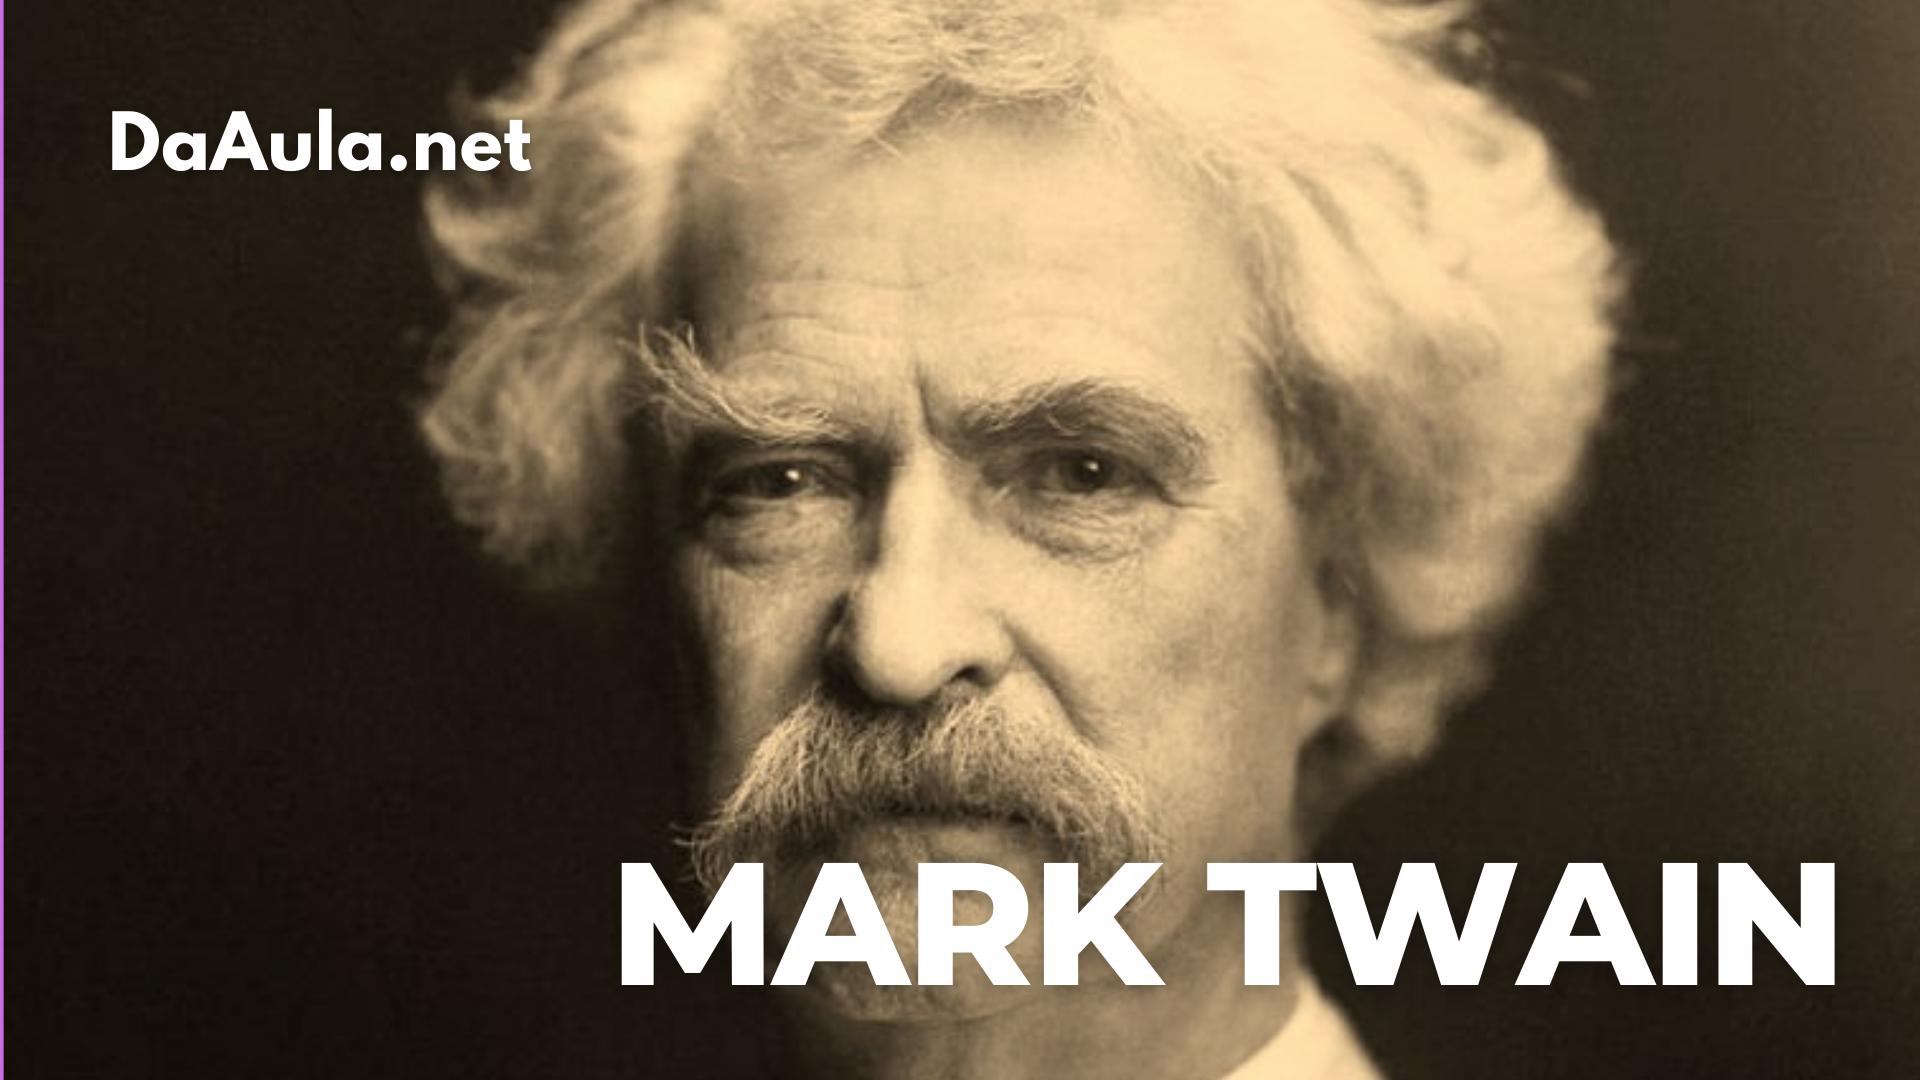 Quem foi Mark Twain